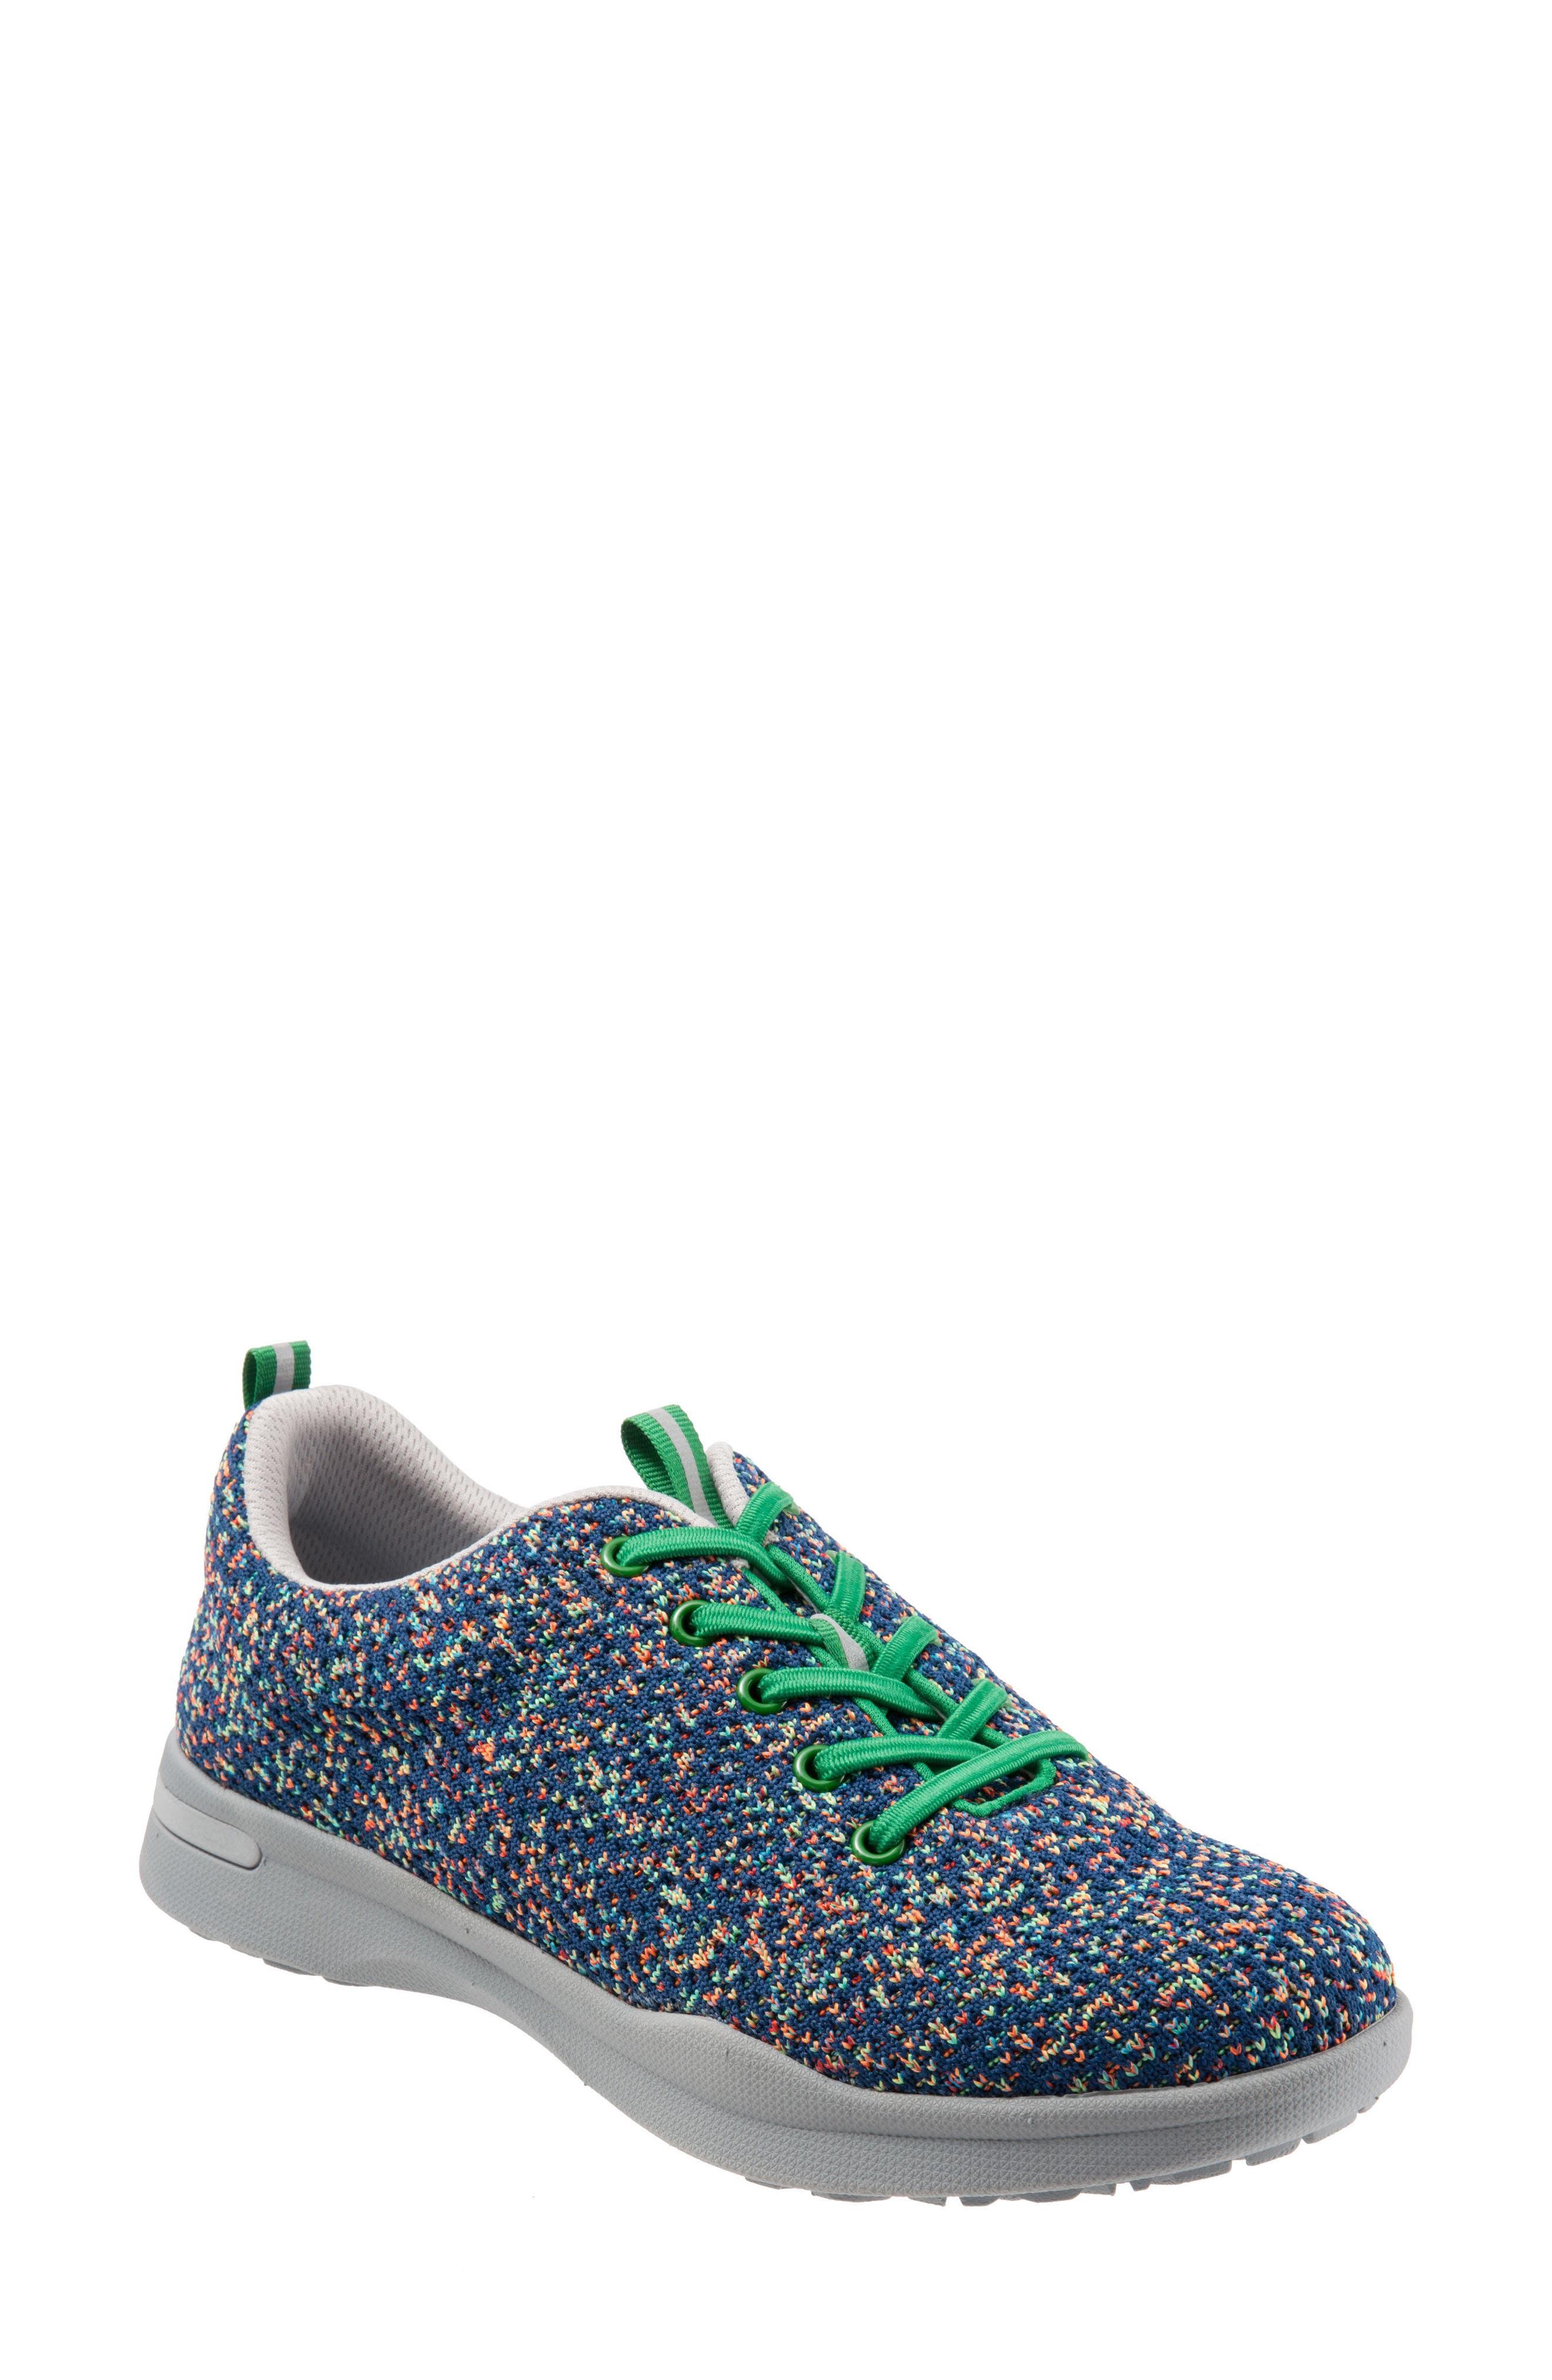 Sampson Sneaker,                         Main,                         color, 410